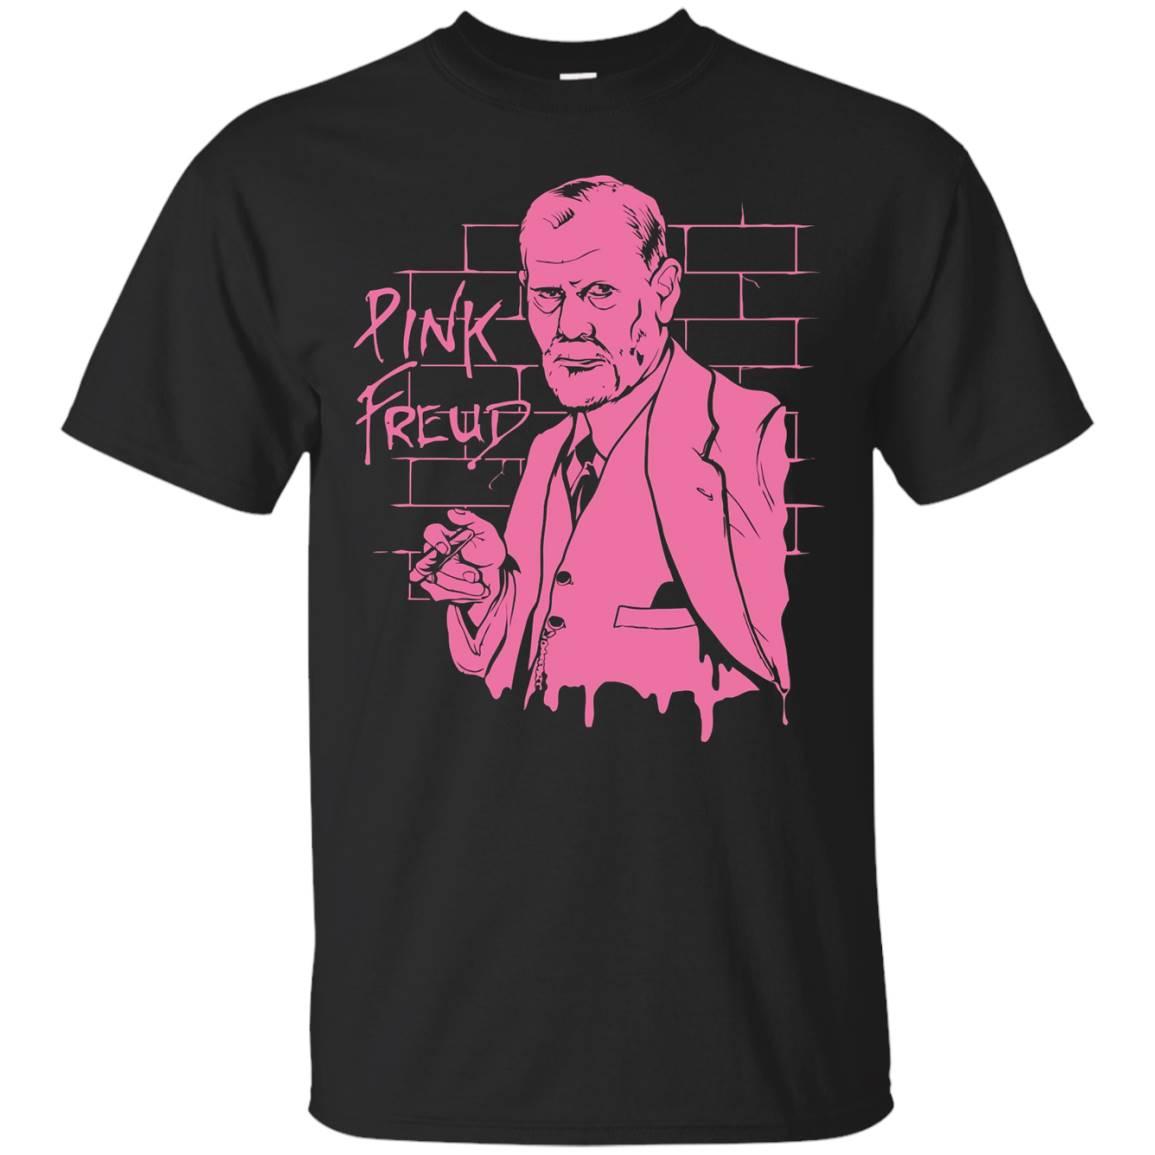 DeBran Shirts Pink Freud T-Shirt